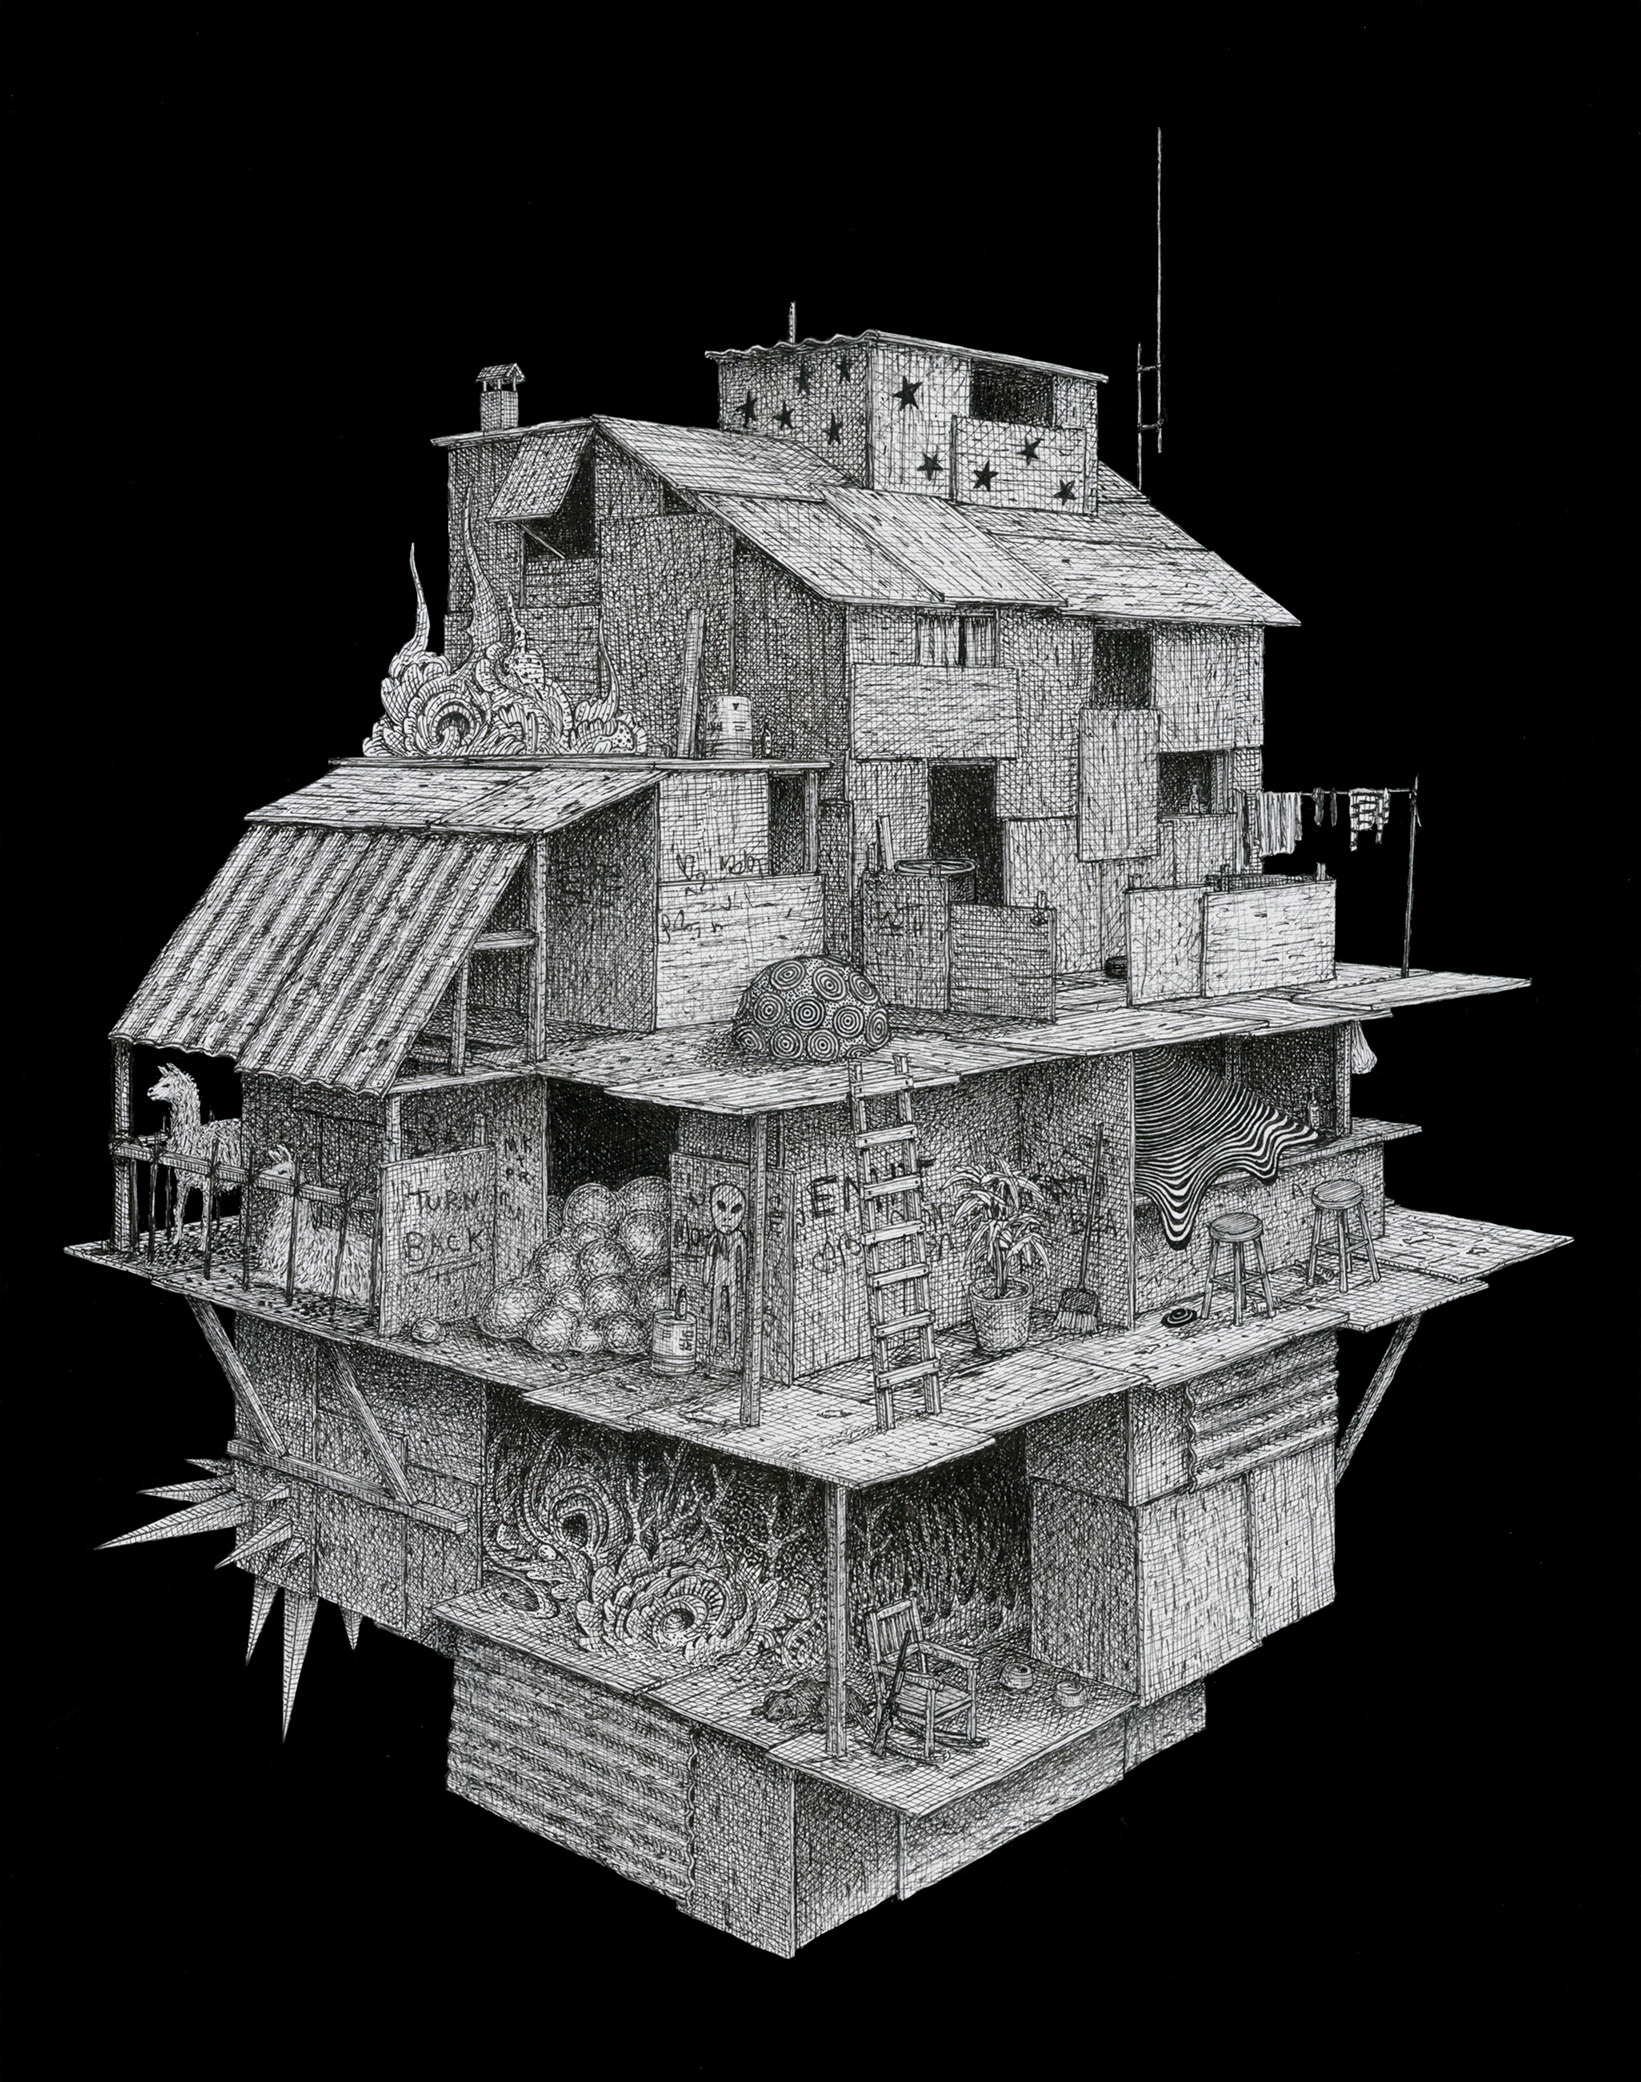 Shanty Spaceship by bentolman